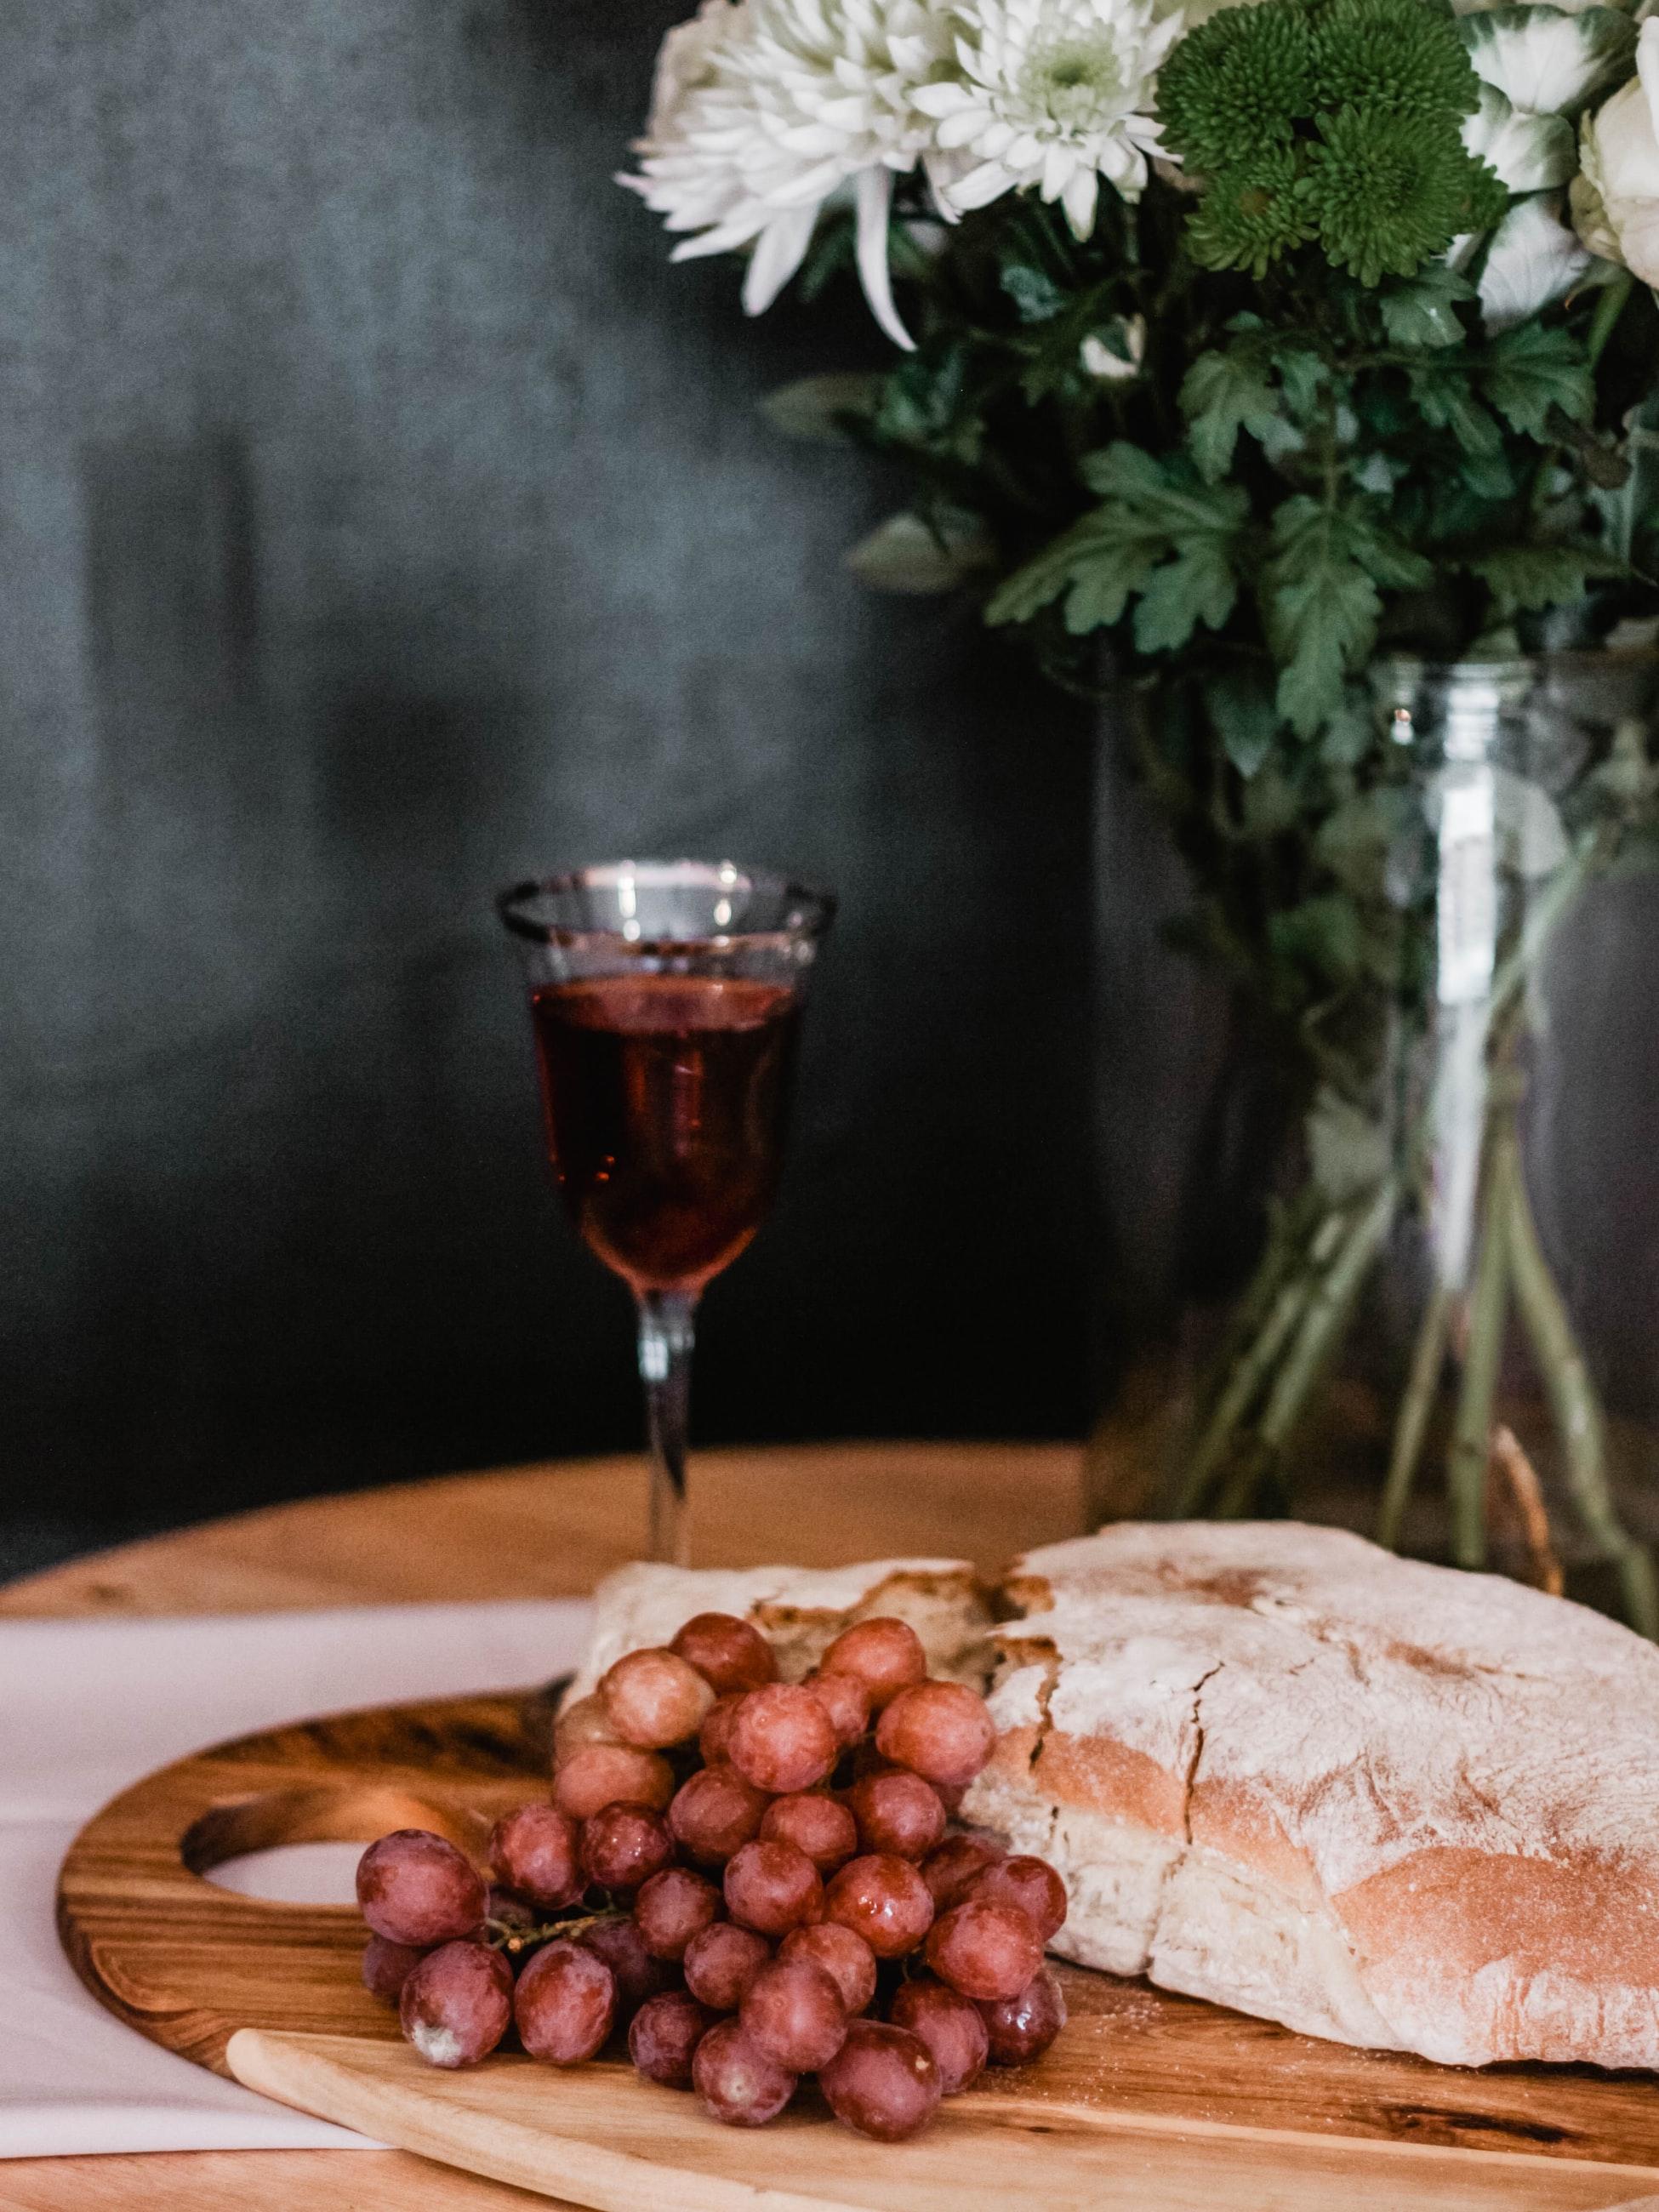 Merendina toscana - pane, vino e zucchero